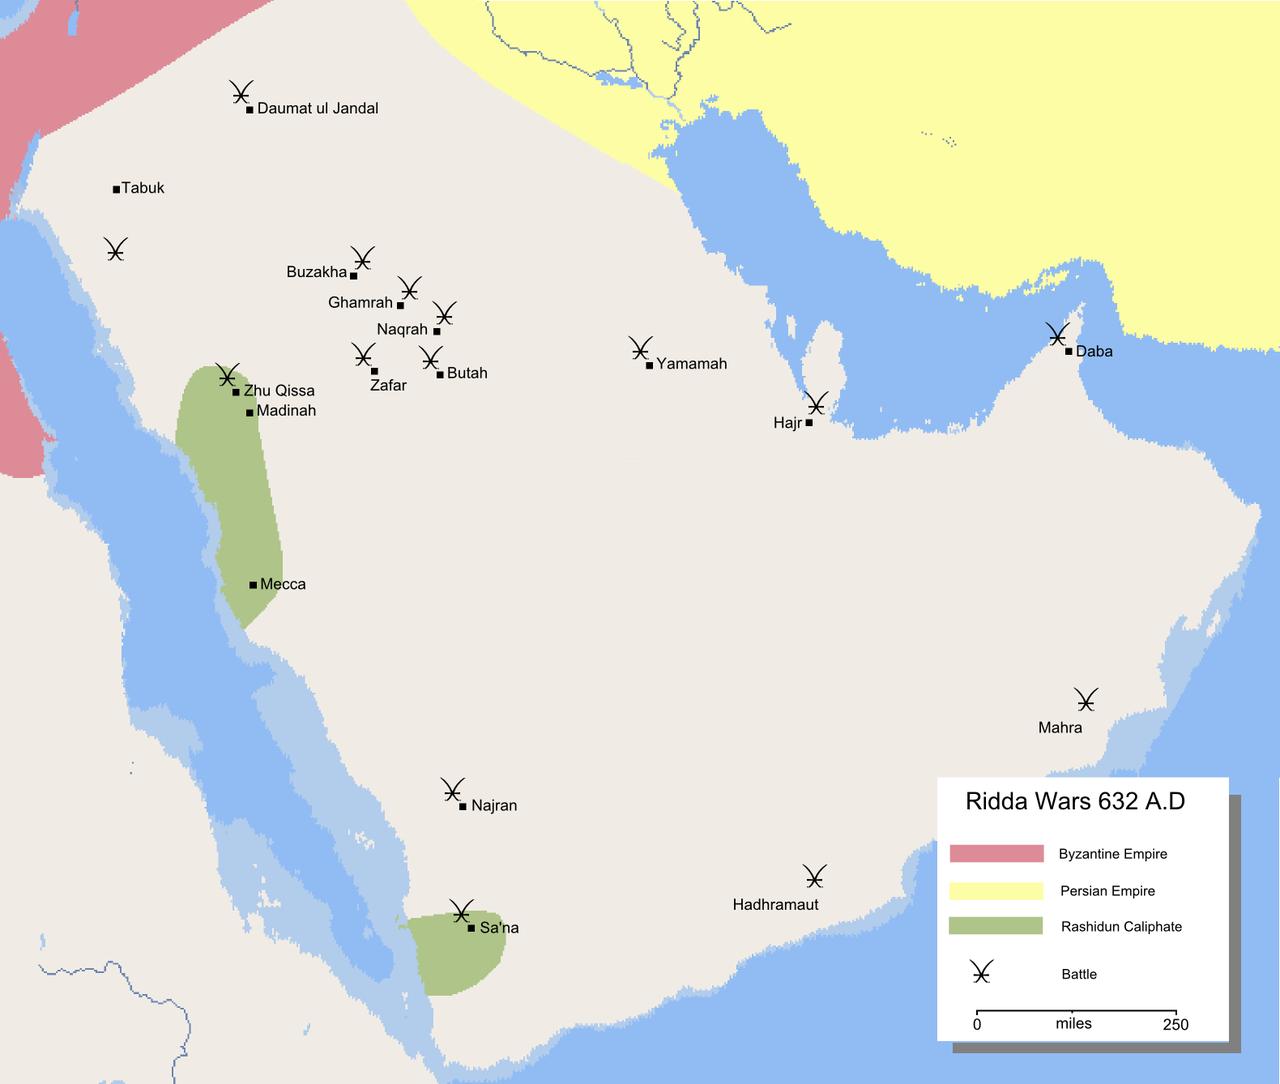 Mohammad_adil-Riddah_wars.png